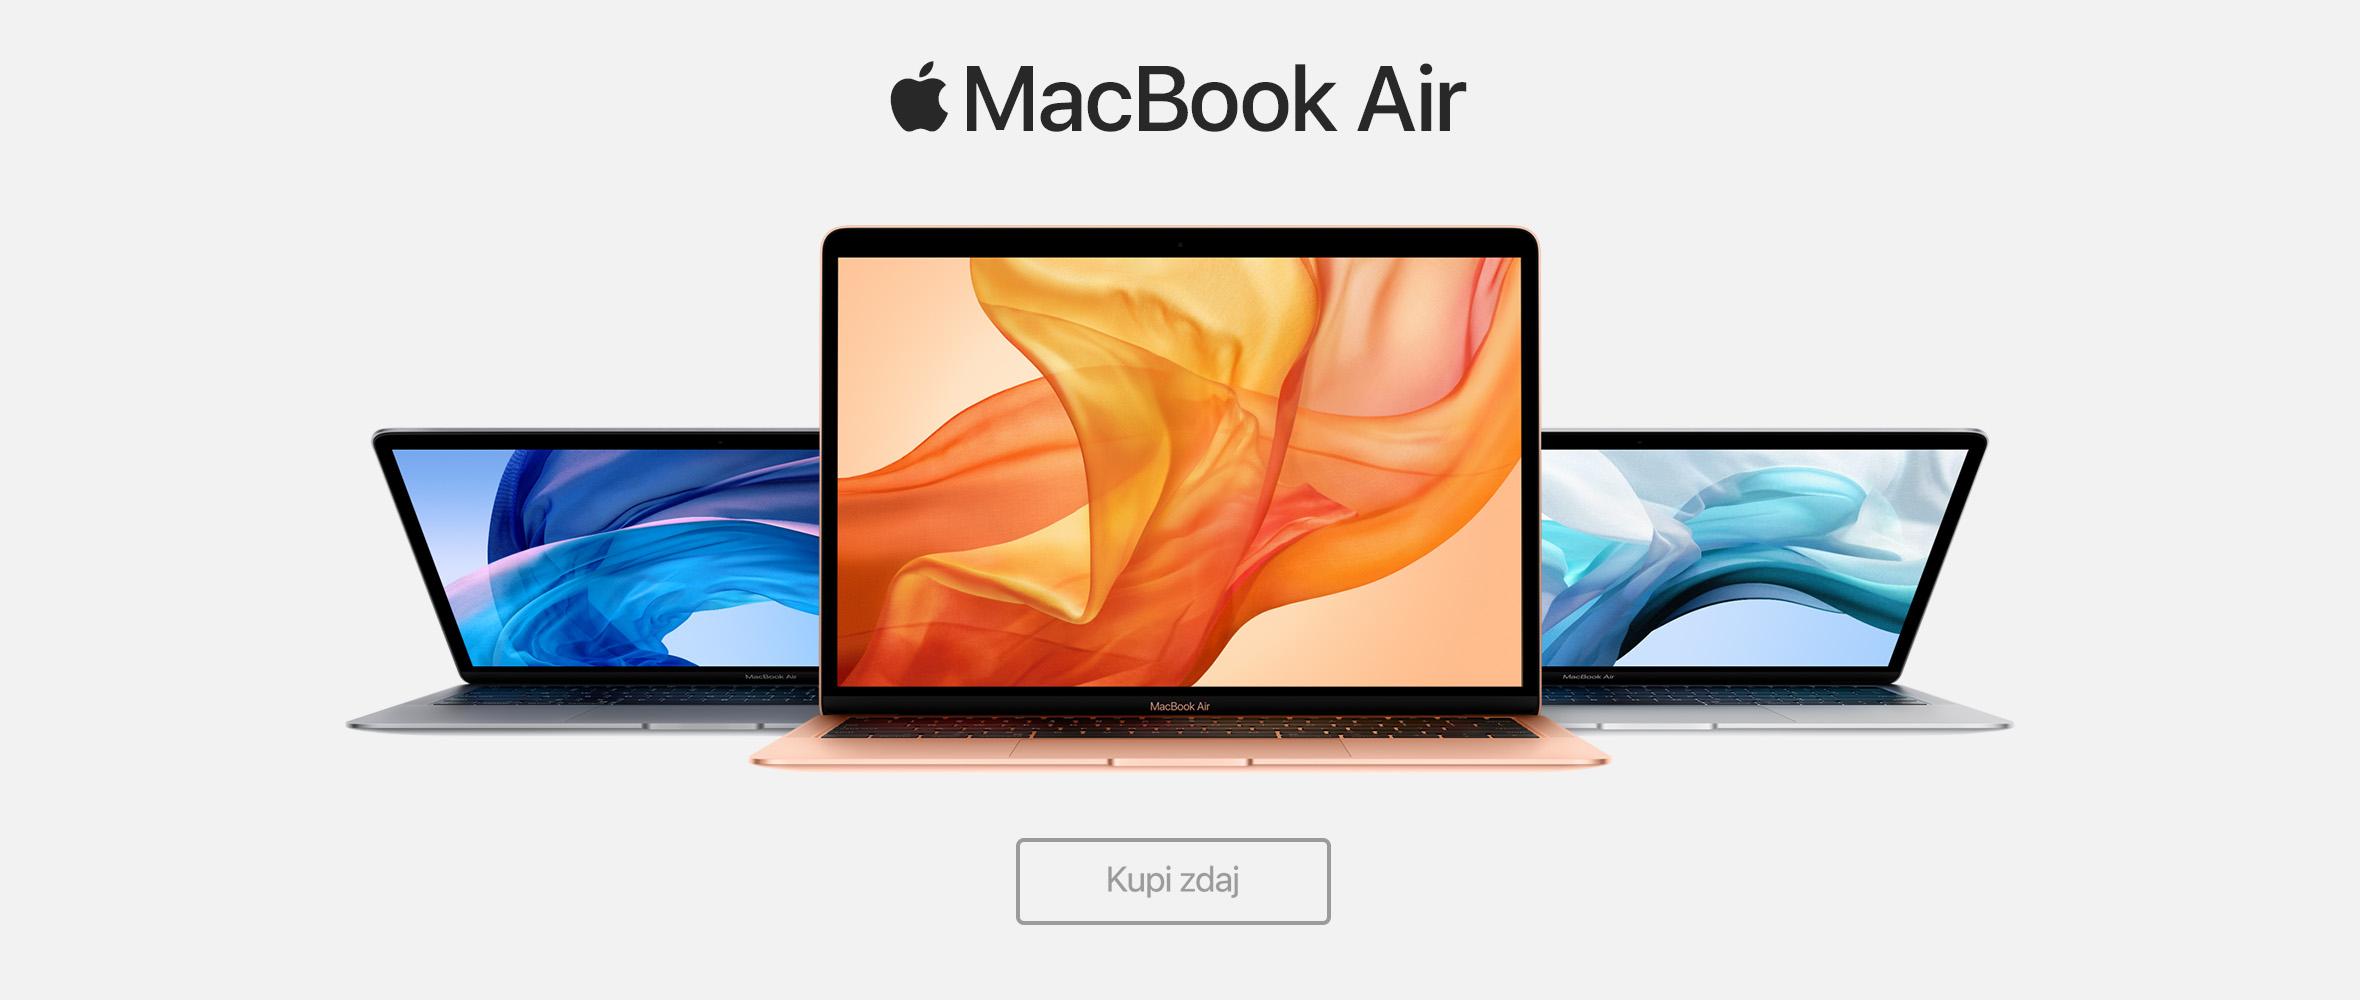 SI - MacBook Air 2018